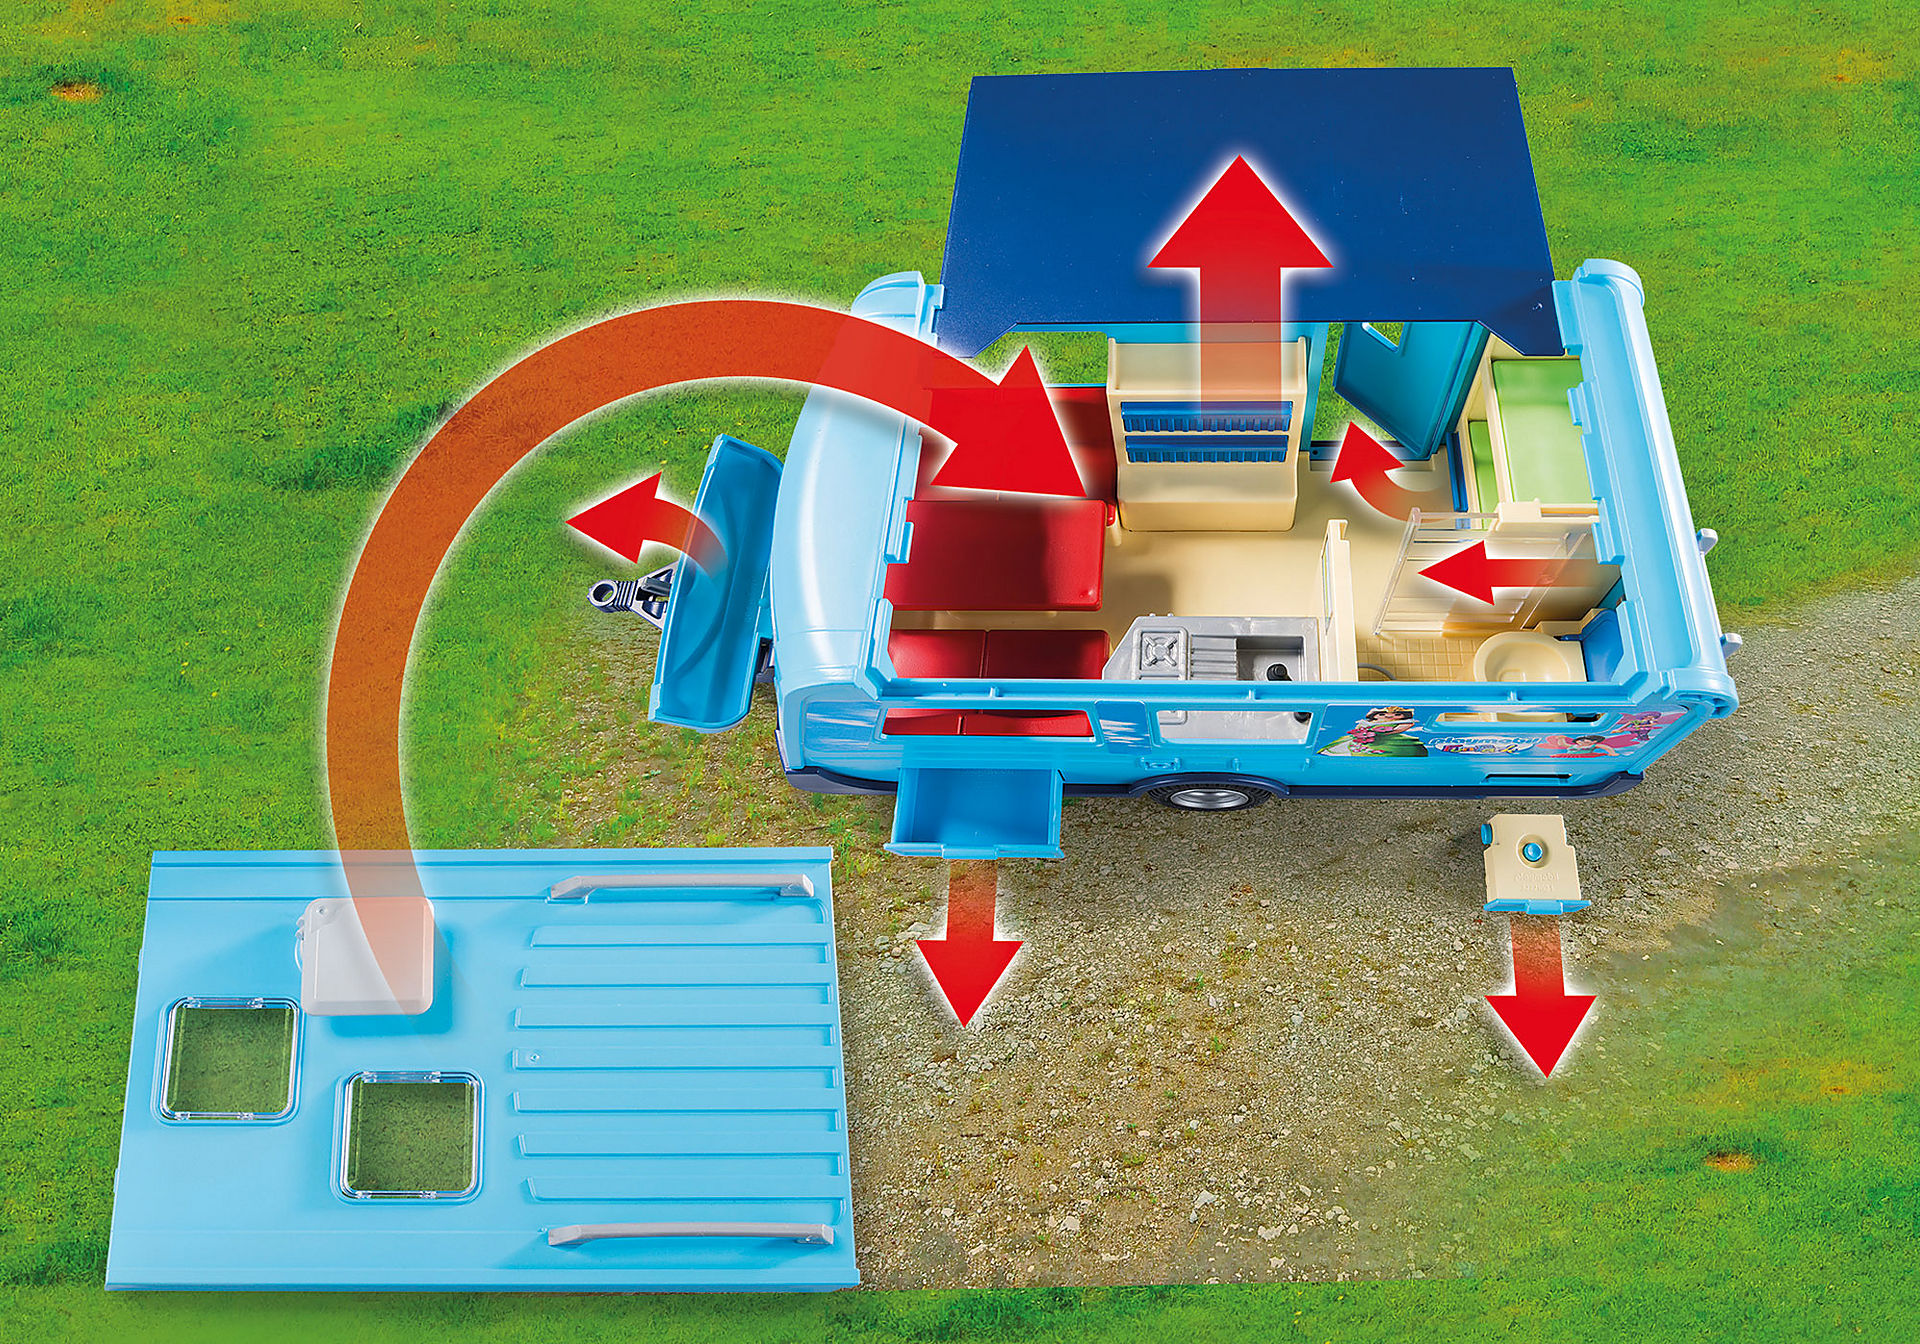 9502 PLAYMOBIL-FunPark Pick-Up mit Wohnwagen zoom image5